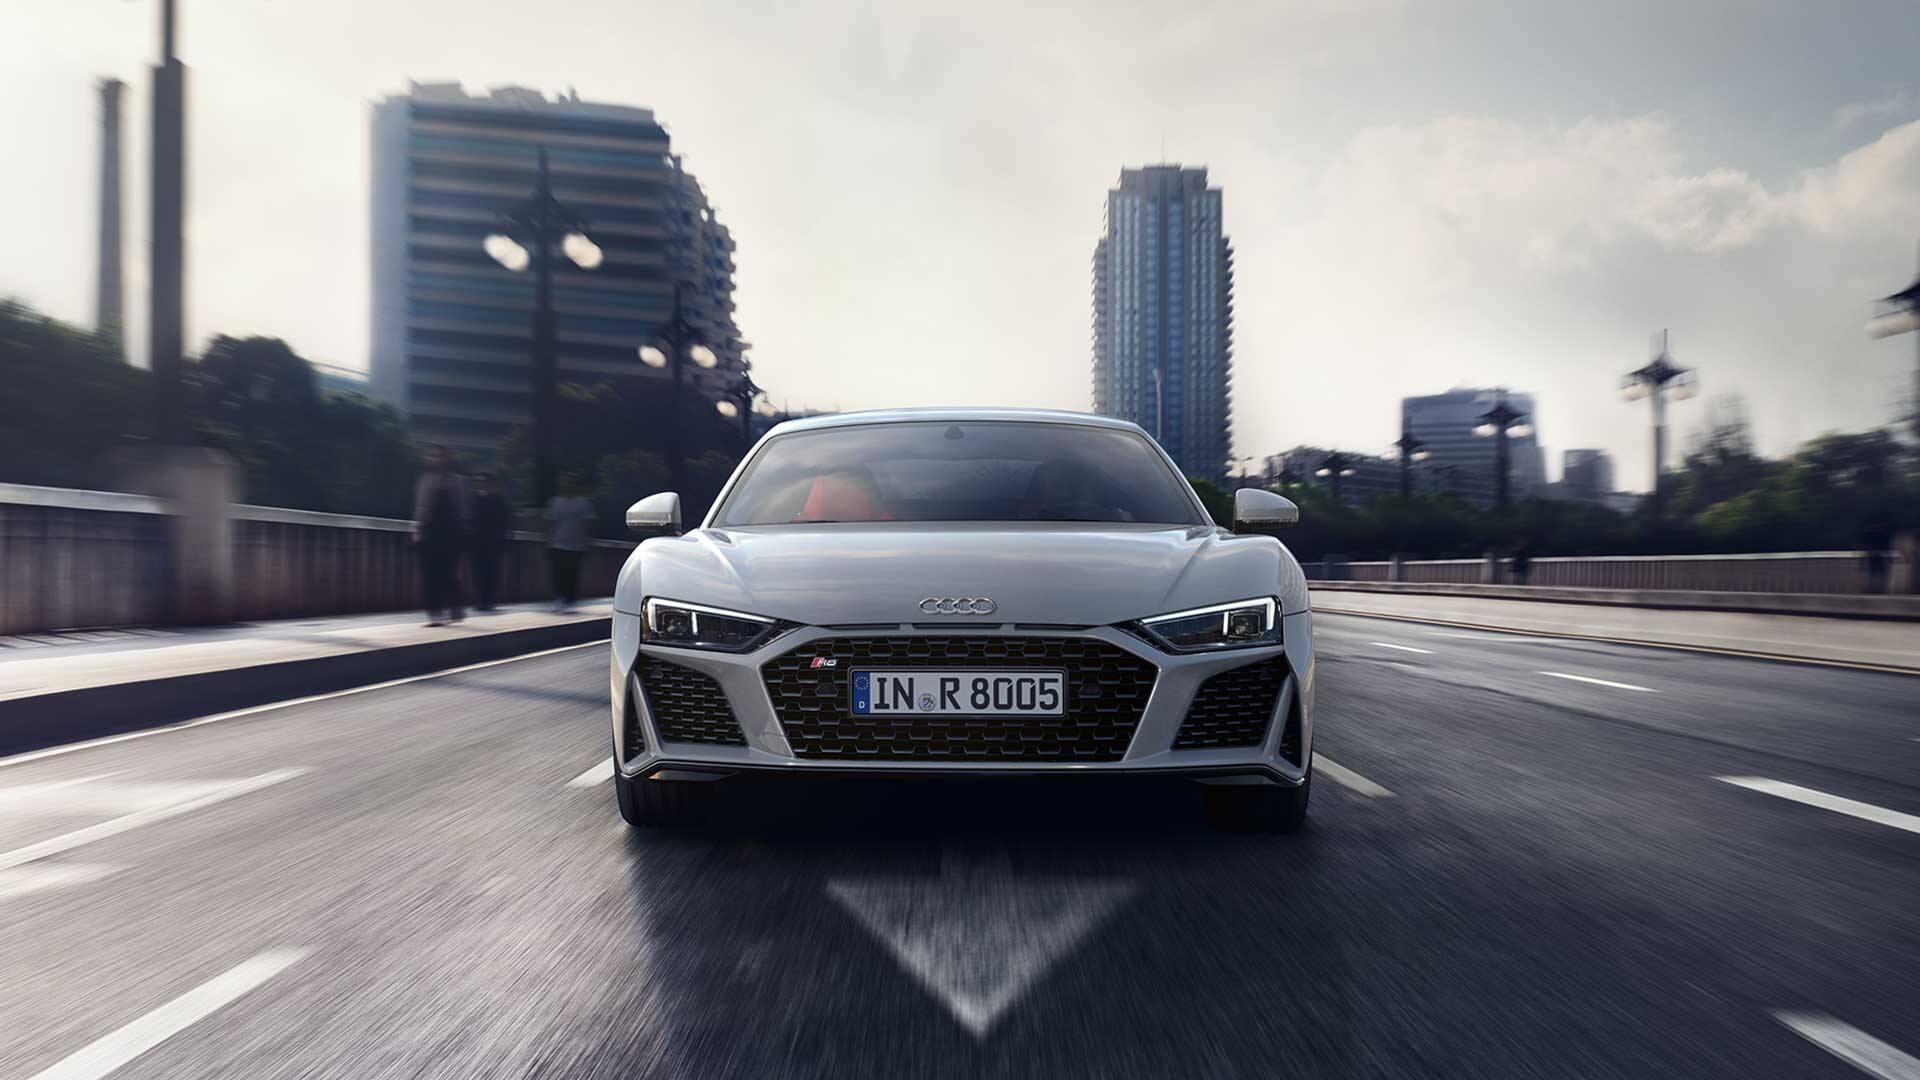 Kekurangan Audi R8 Coupé Harga